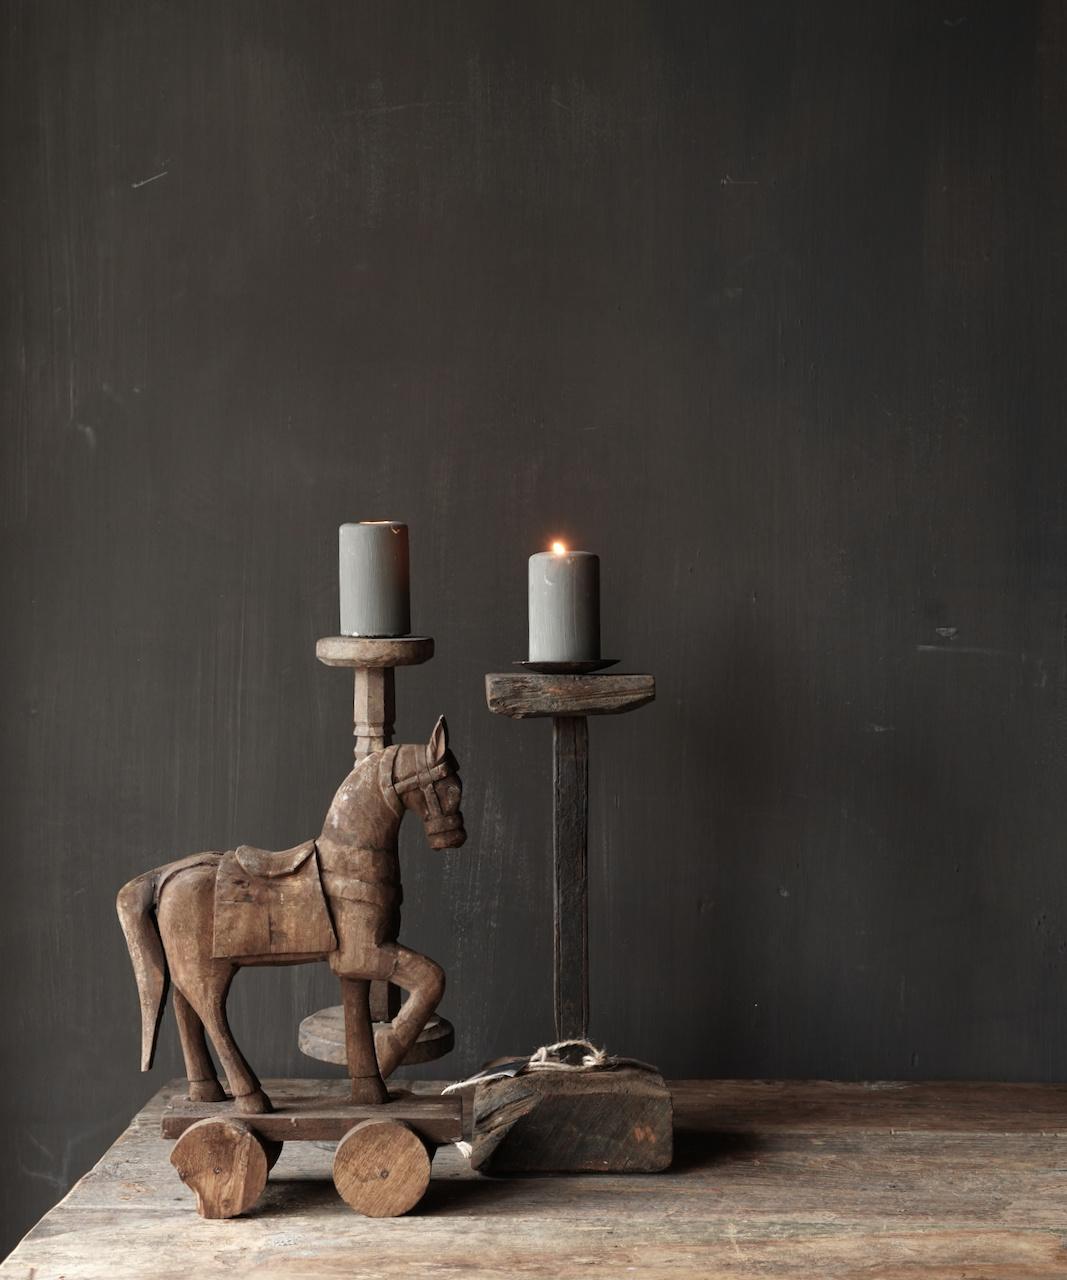 Holzpferd handgefertigt aus altem Holz-1